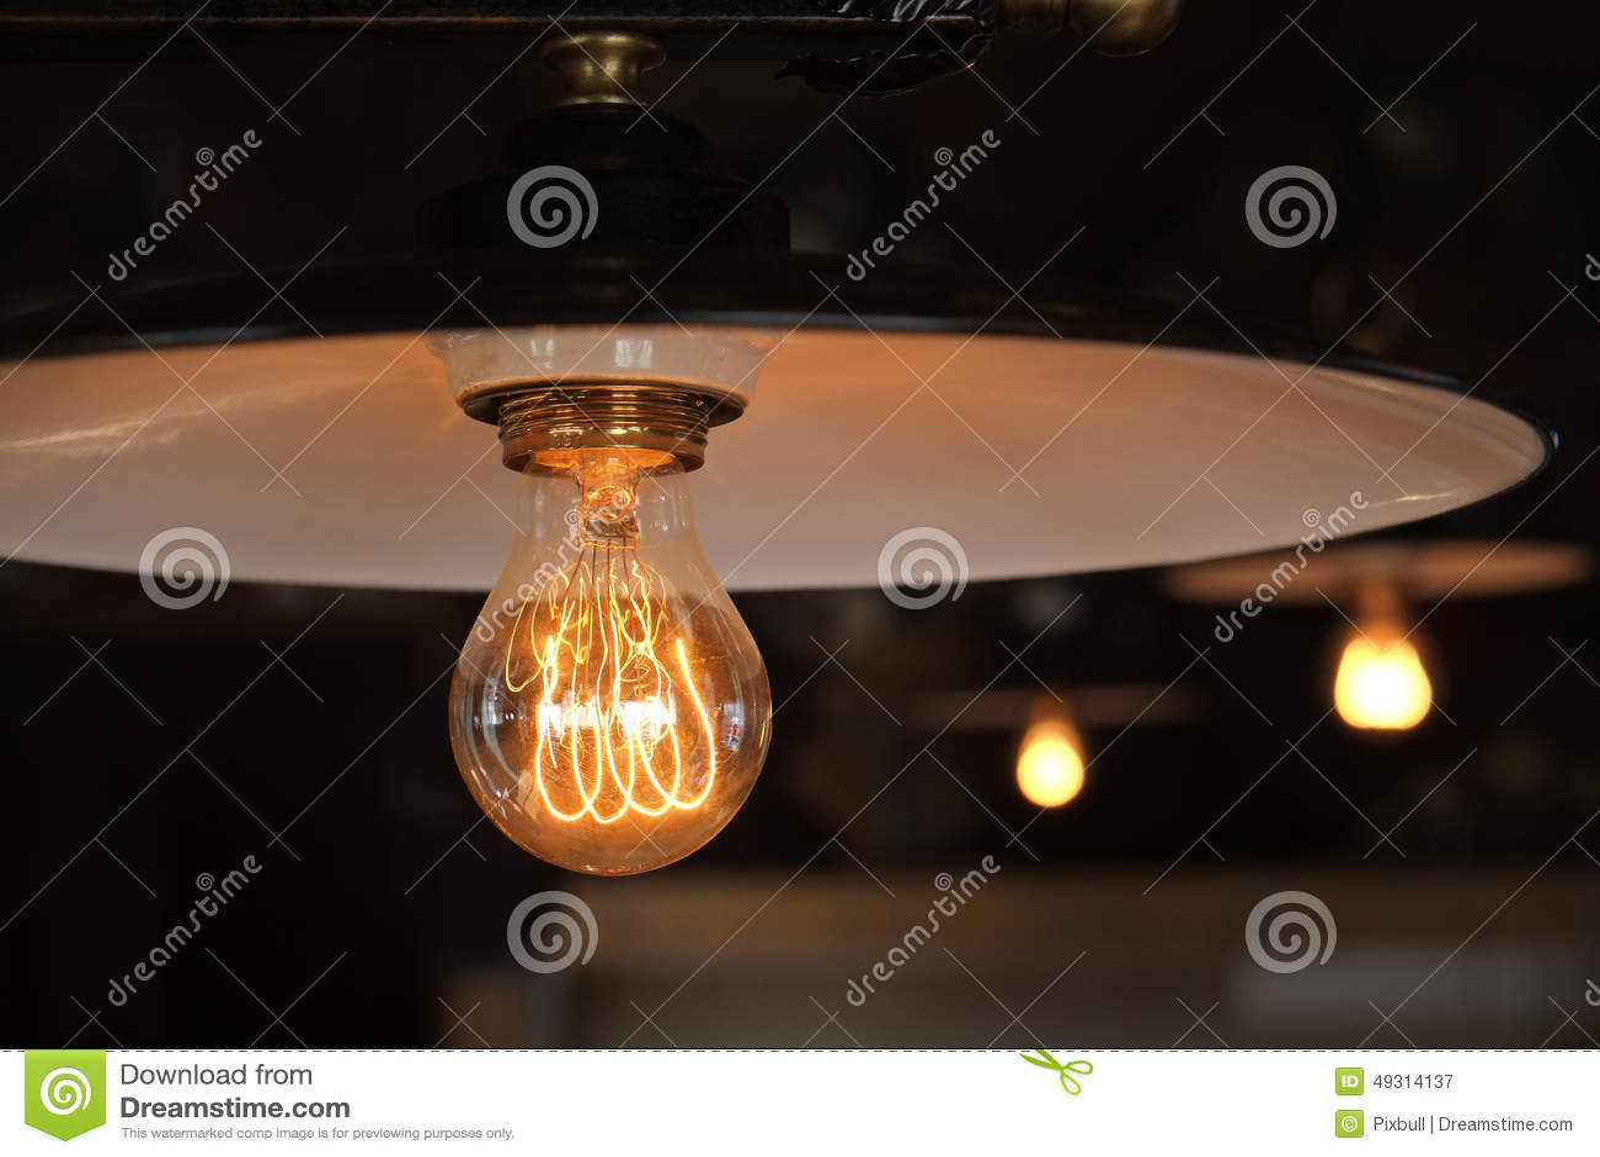 the honest kitchen aid stand mixer cover 螺旋白炽灯库存图片 图片包括有玻璃 当前 节俭 阿克拉 诚实 样式 有螺旋钨细丝的厨房灯